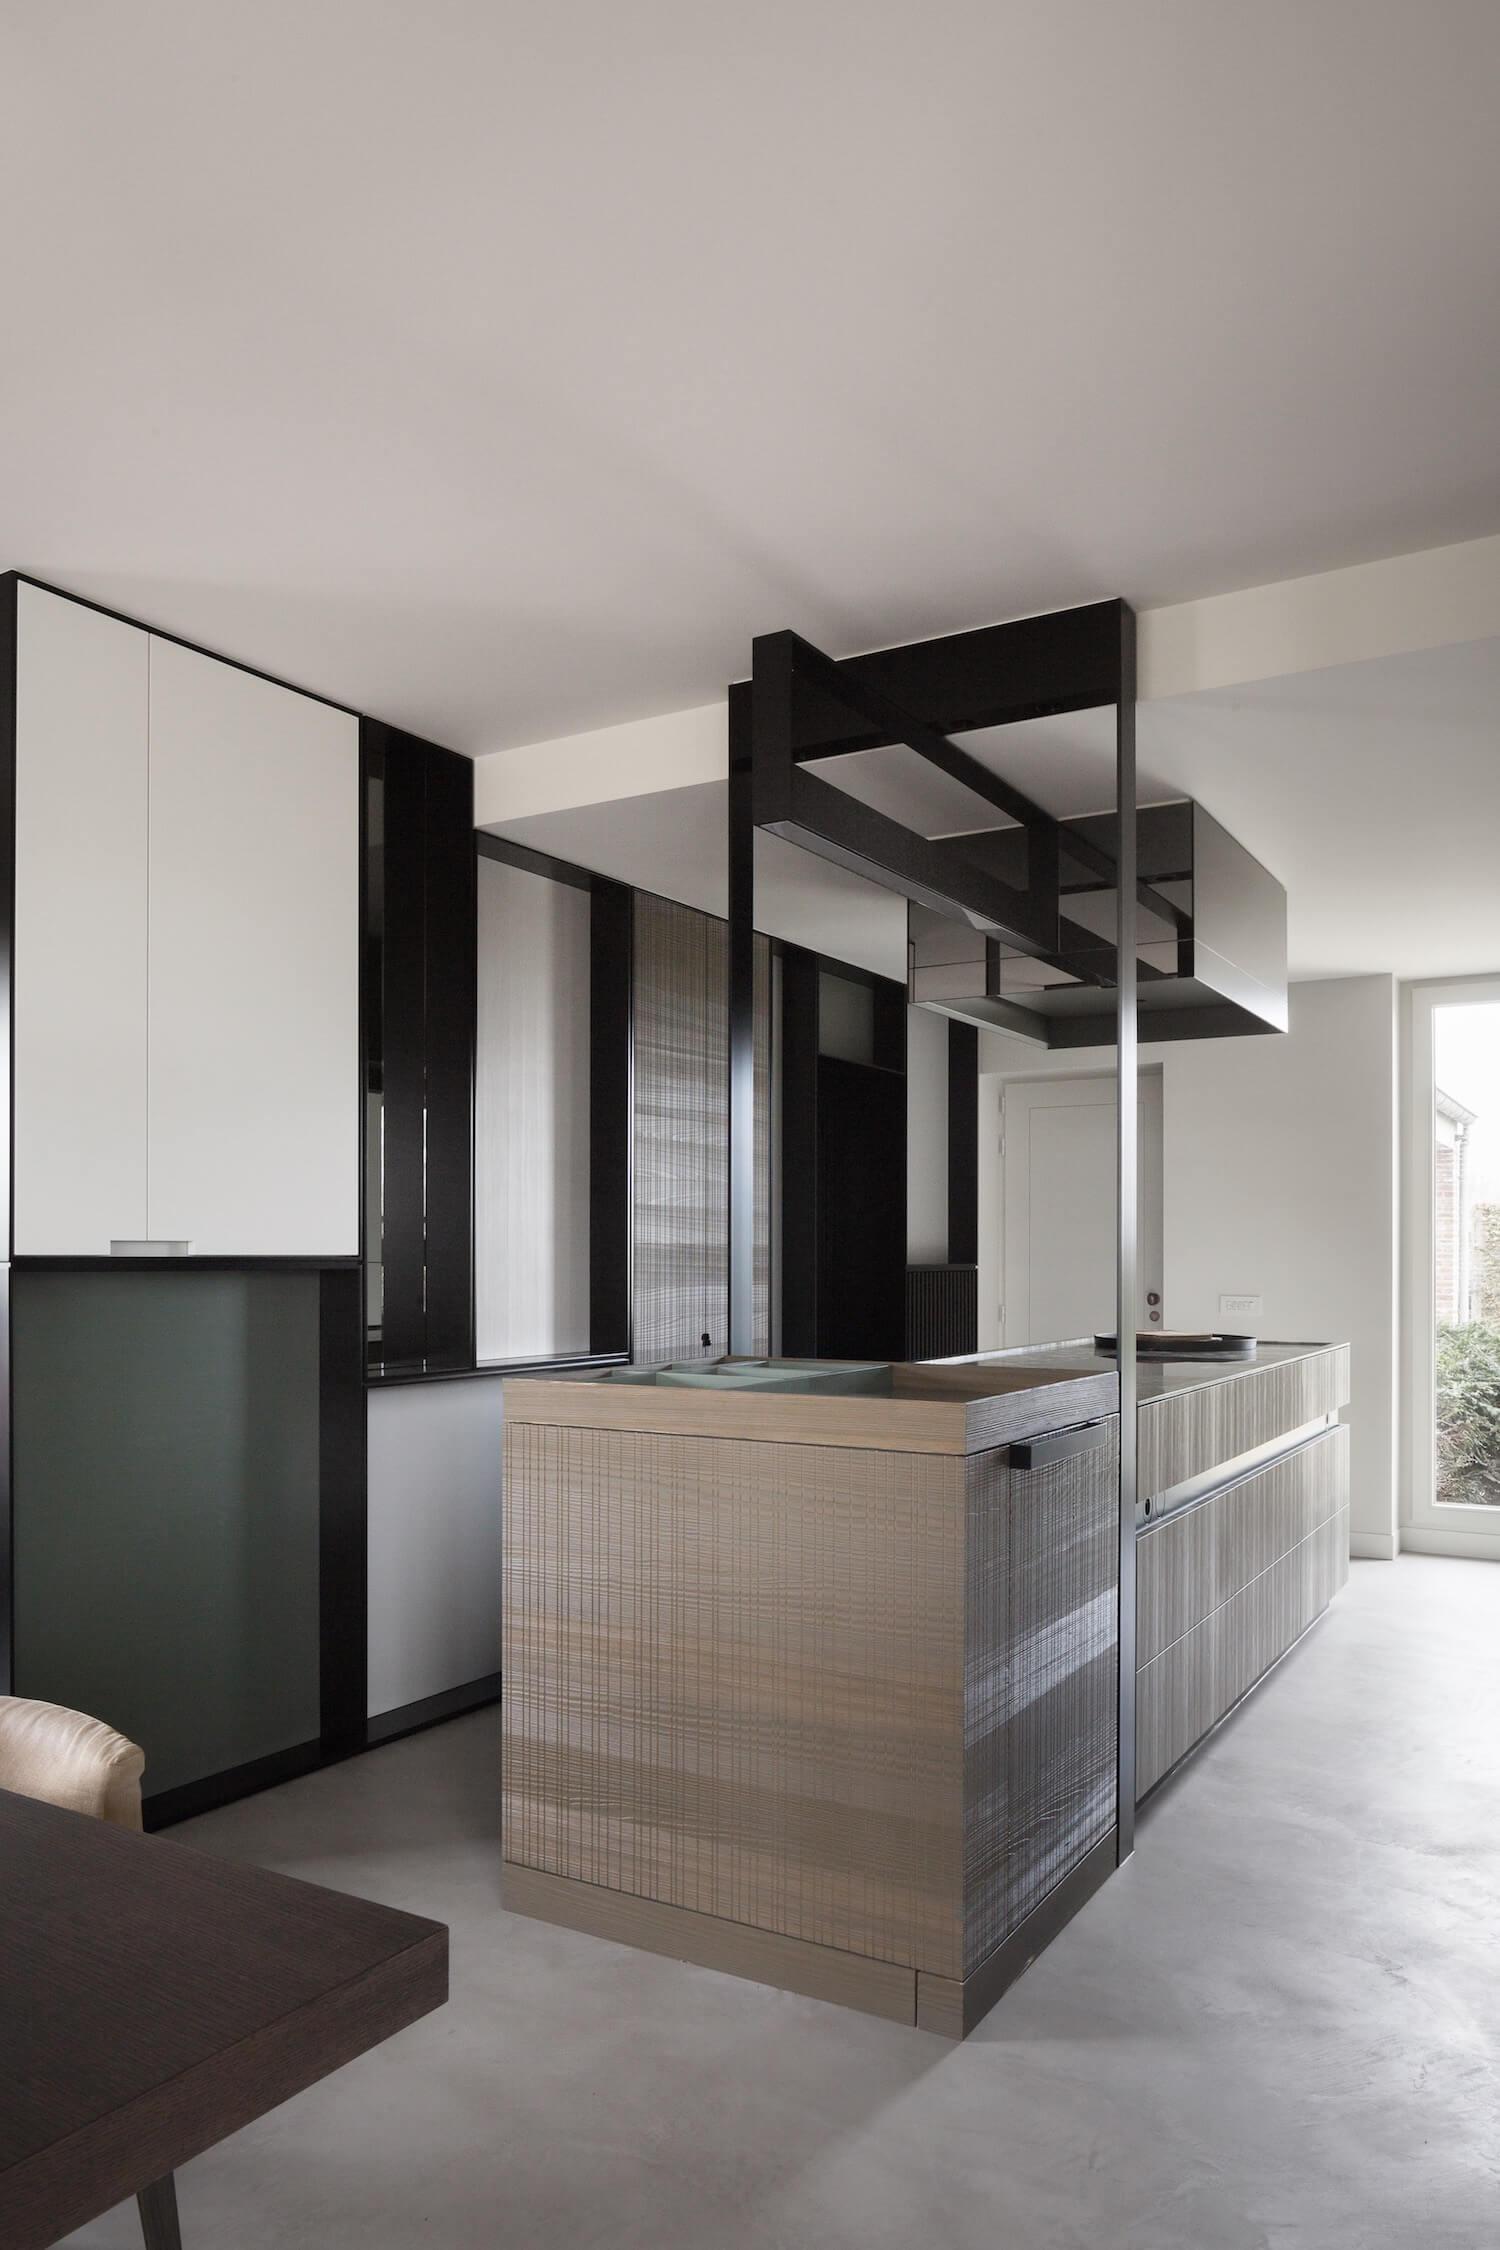 est living frederic kielemoes cafeine belgian apartment 6